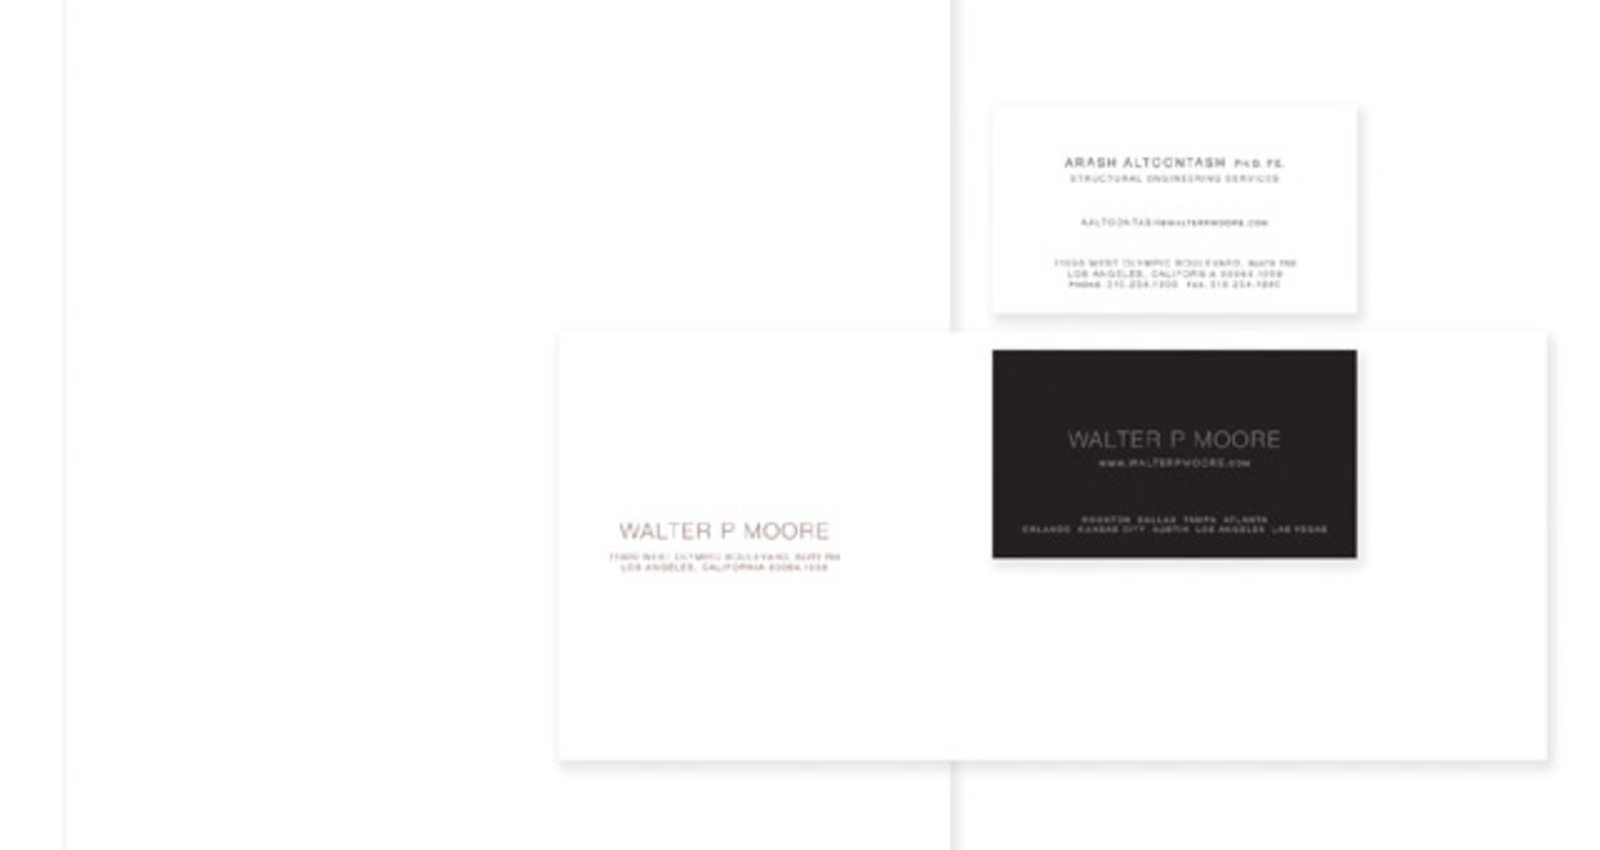 Walter P Moore Identity Program